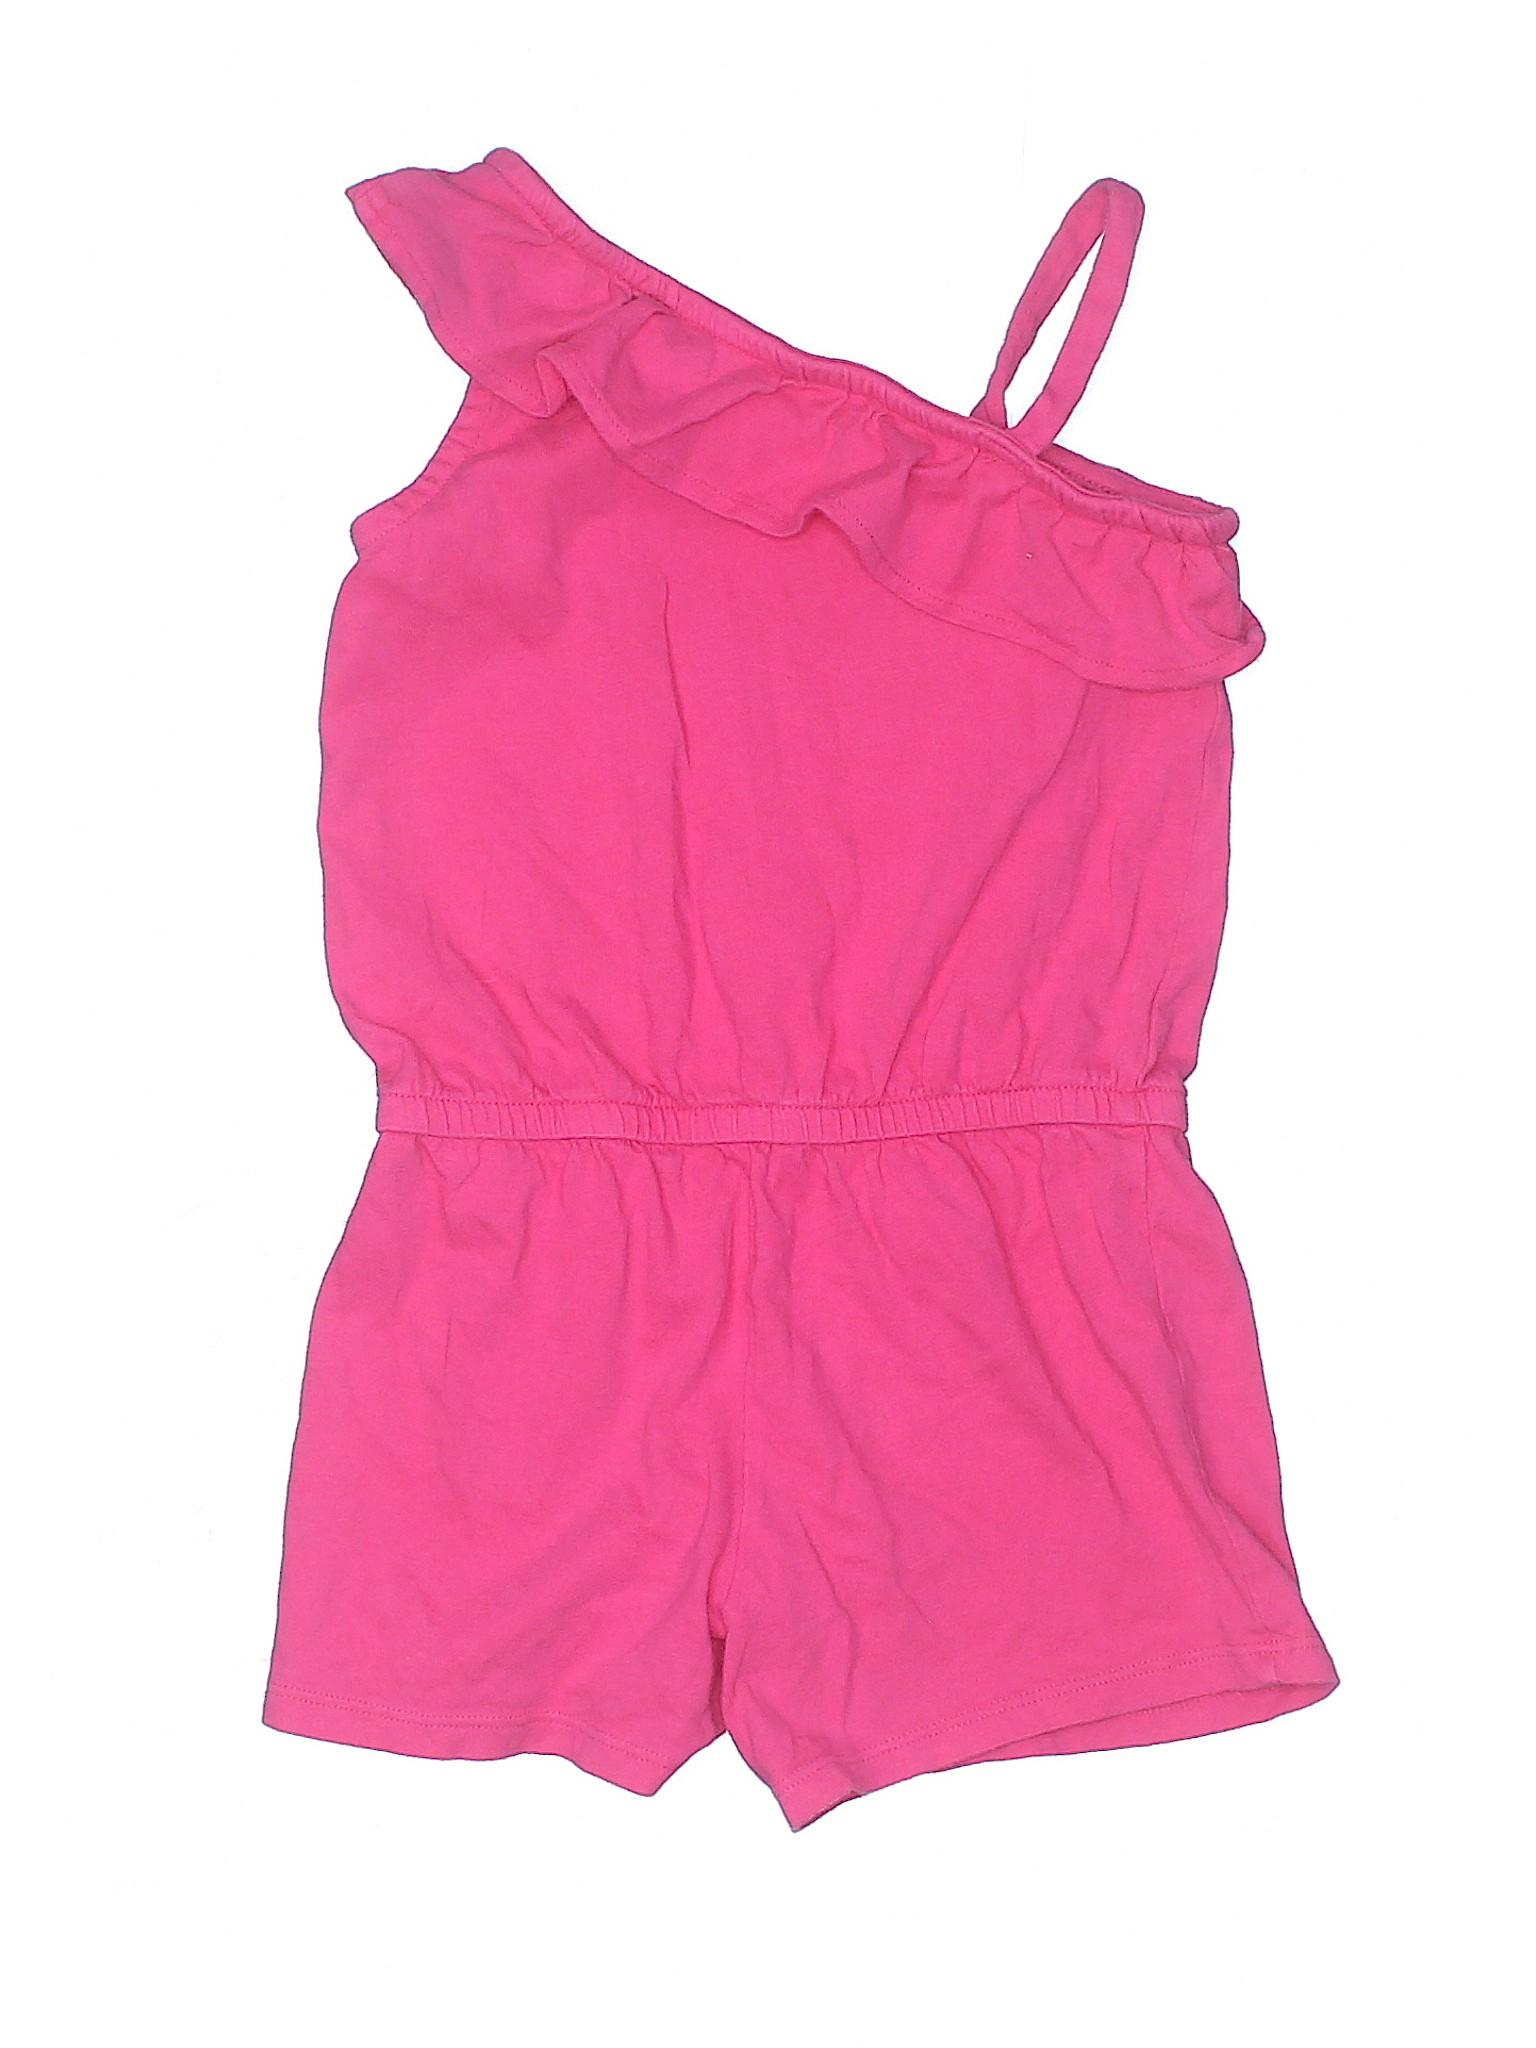 bd9e436e501d Best Brand-new With Tags Gymboree Pajama Set Pumpkin Trick Or Treat Basket  Candy Black Orange Girls Pj 12 2piece Fit More 8-10 for sale in Deland, .